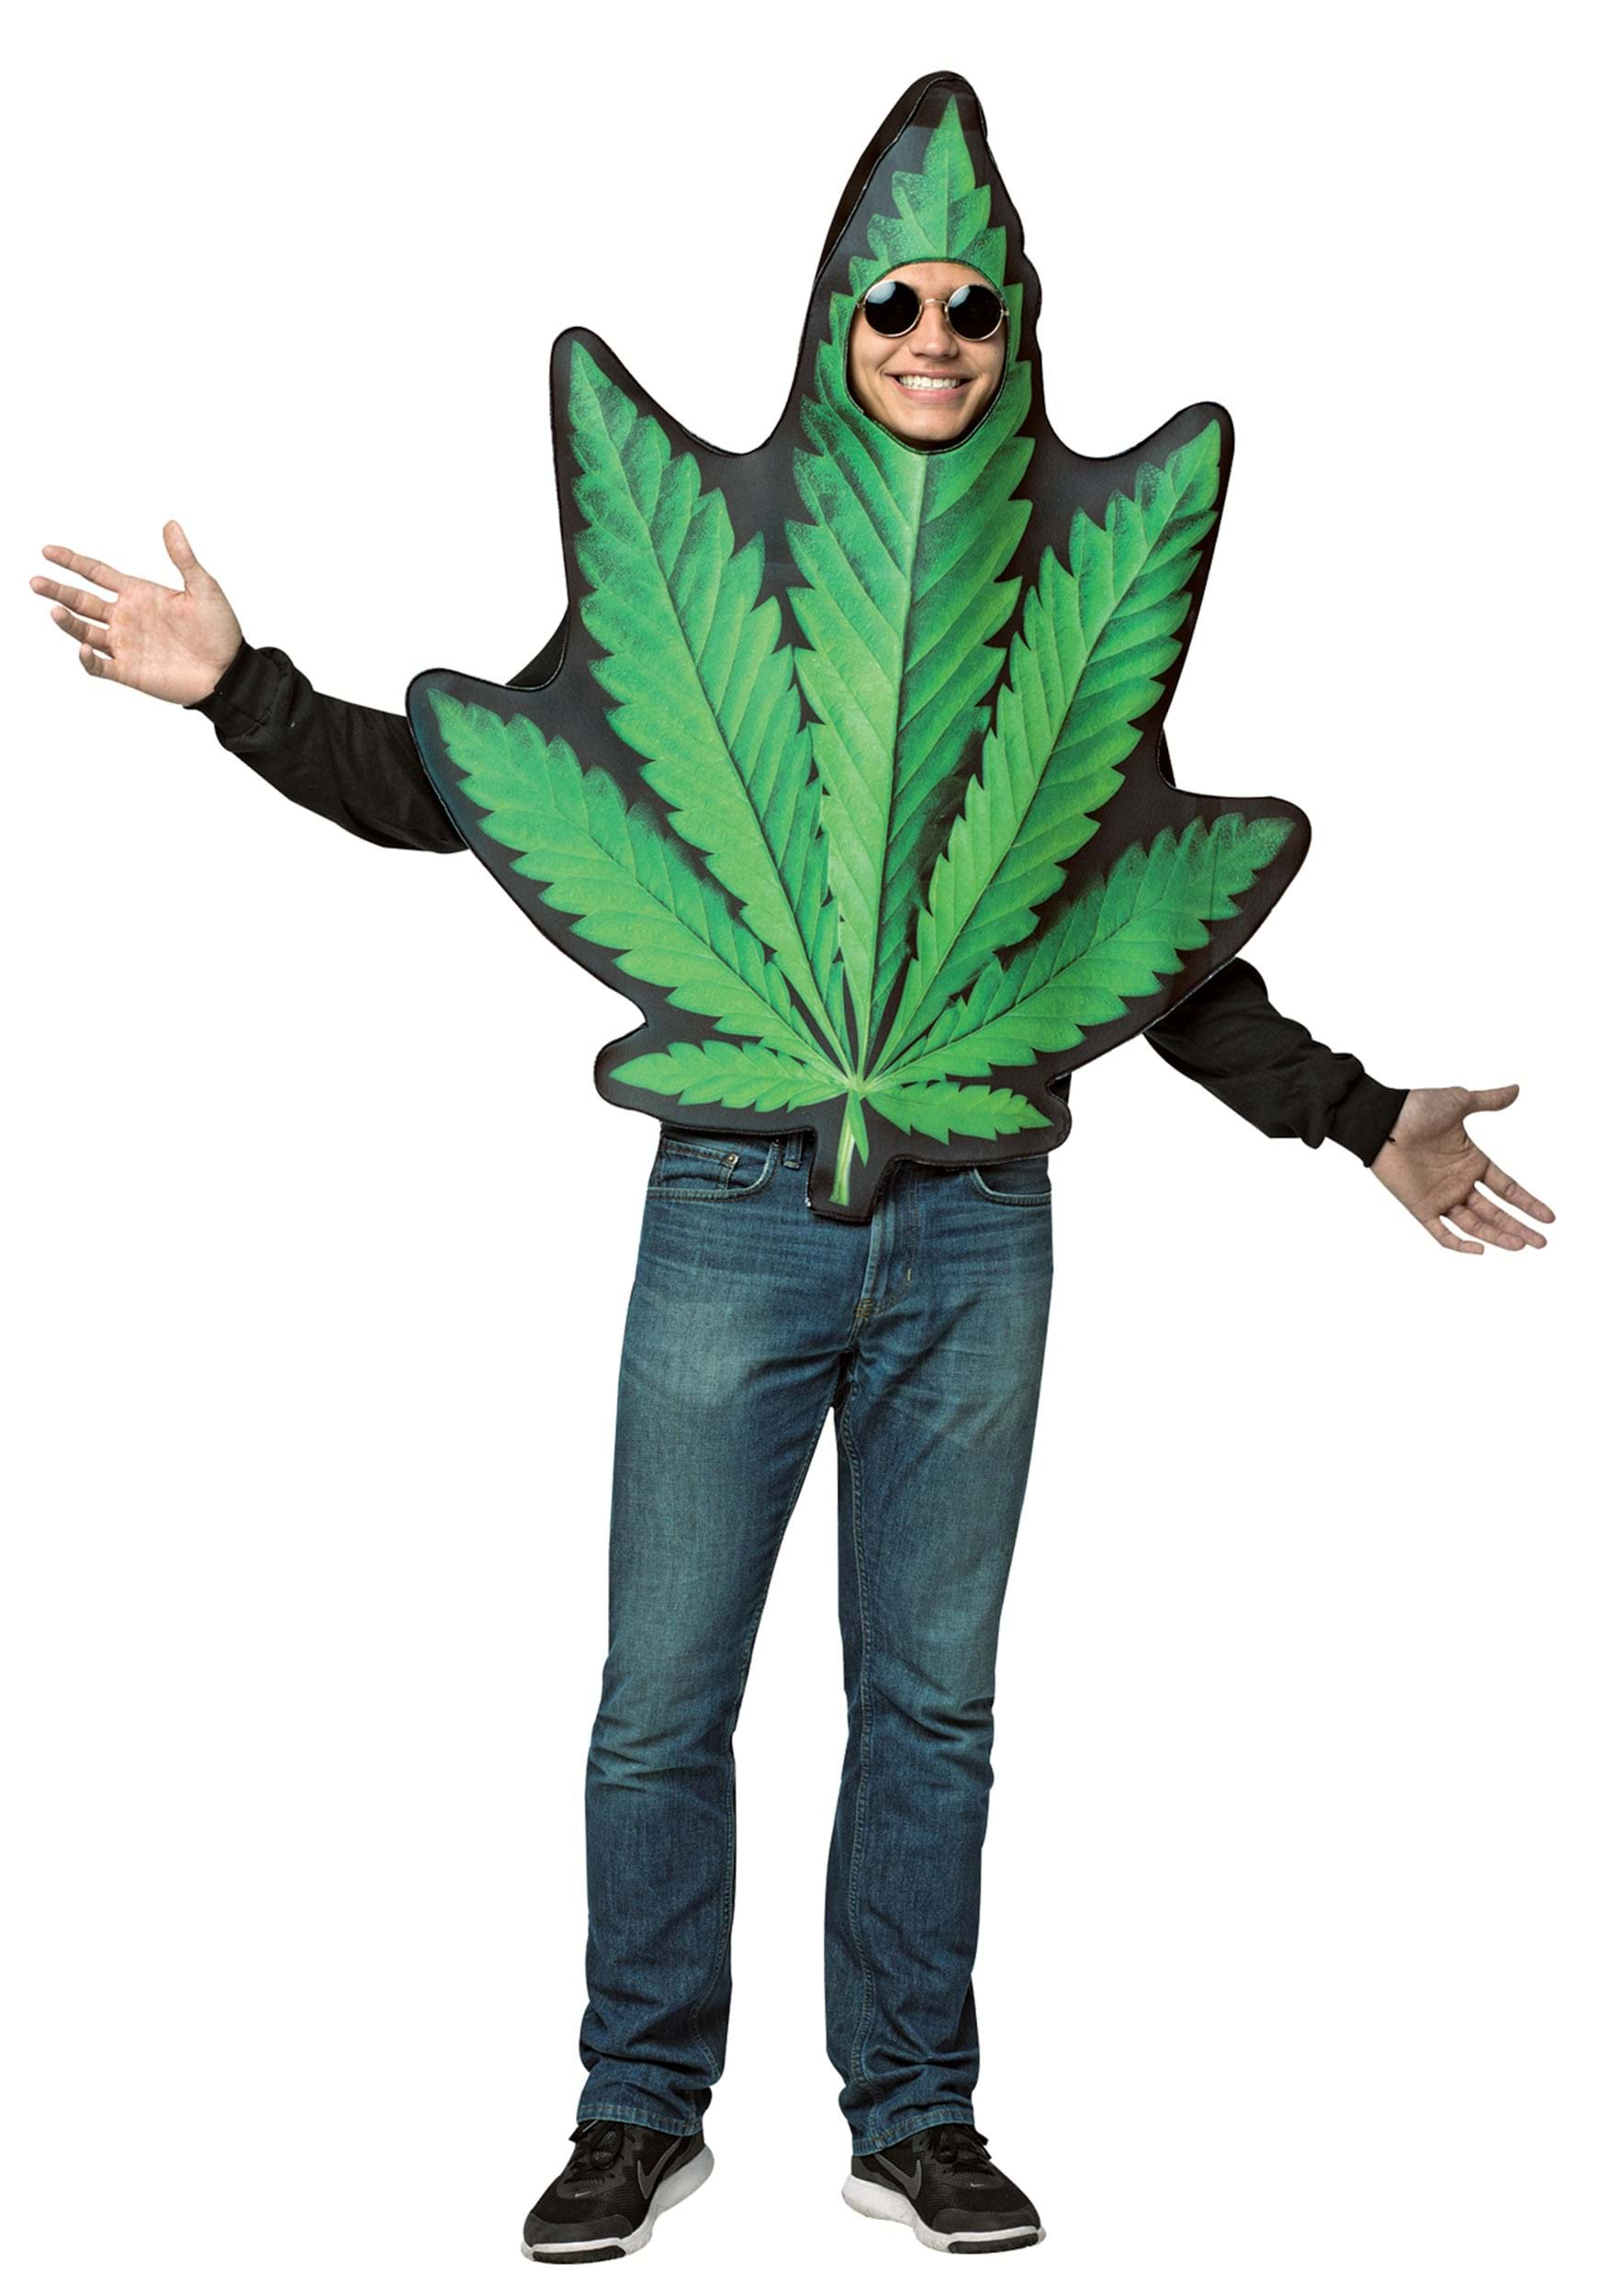 Pot Leaf Costume for Adults